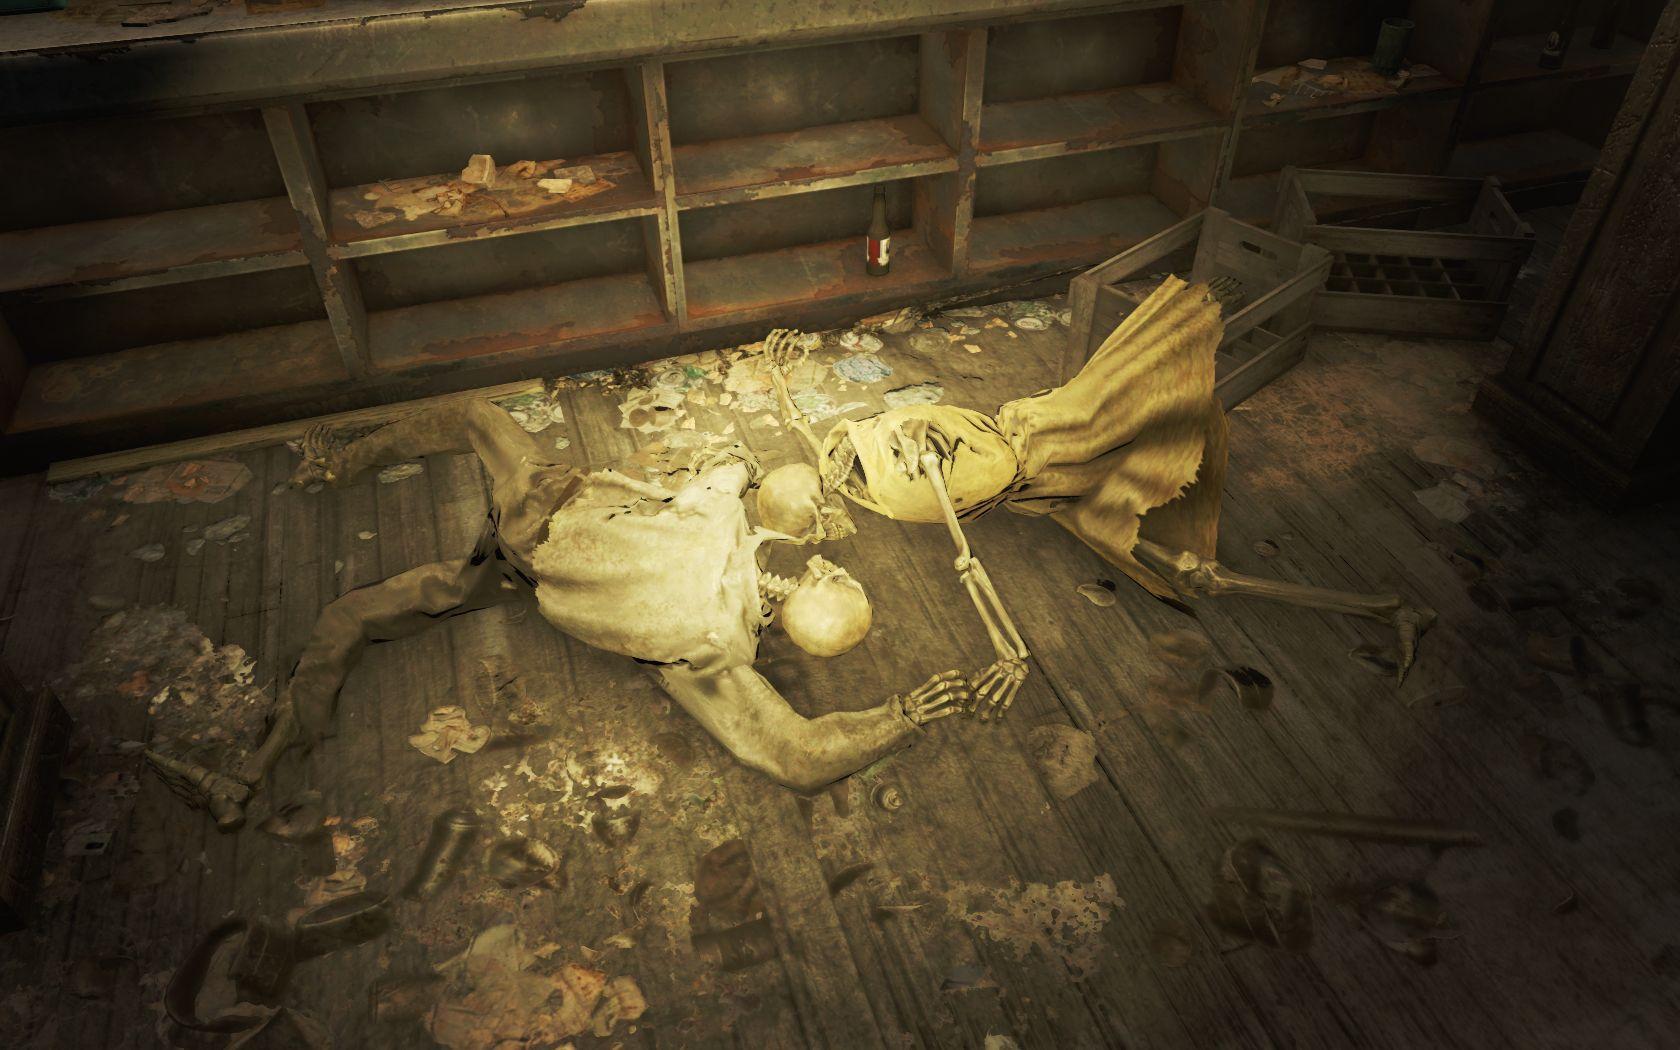 Бар 'За ваше здоровье!' 4 - Fallout 4 Скелет, Юмор